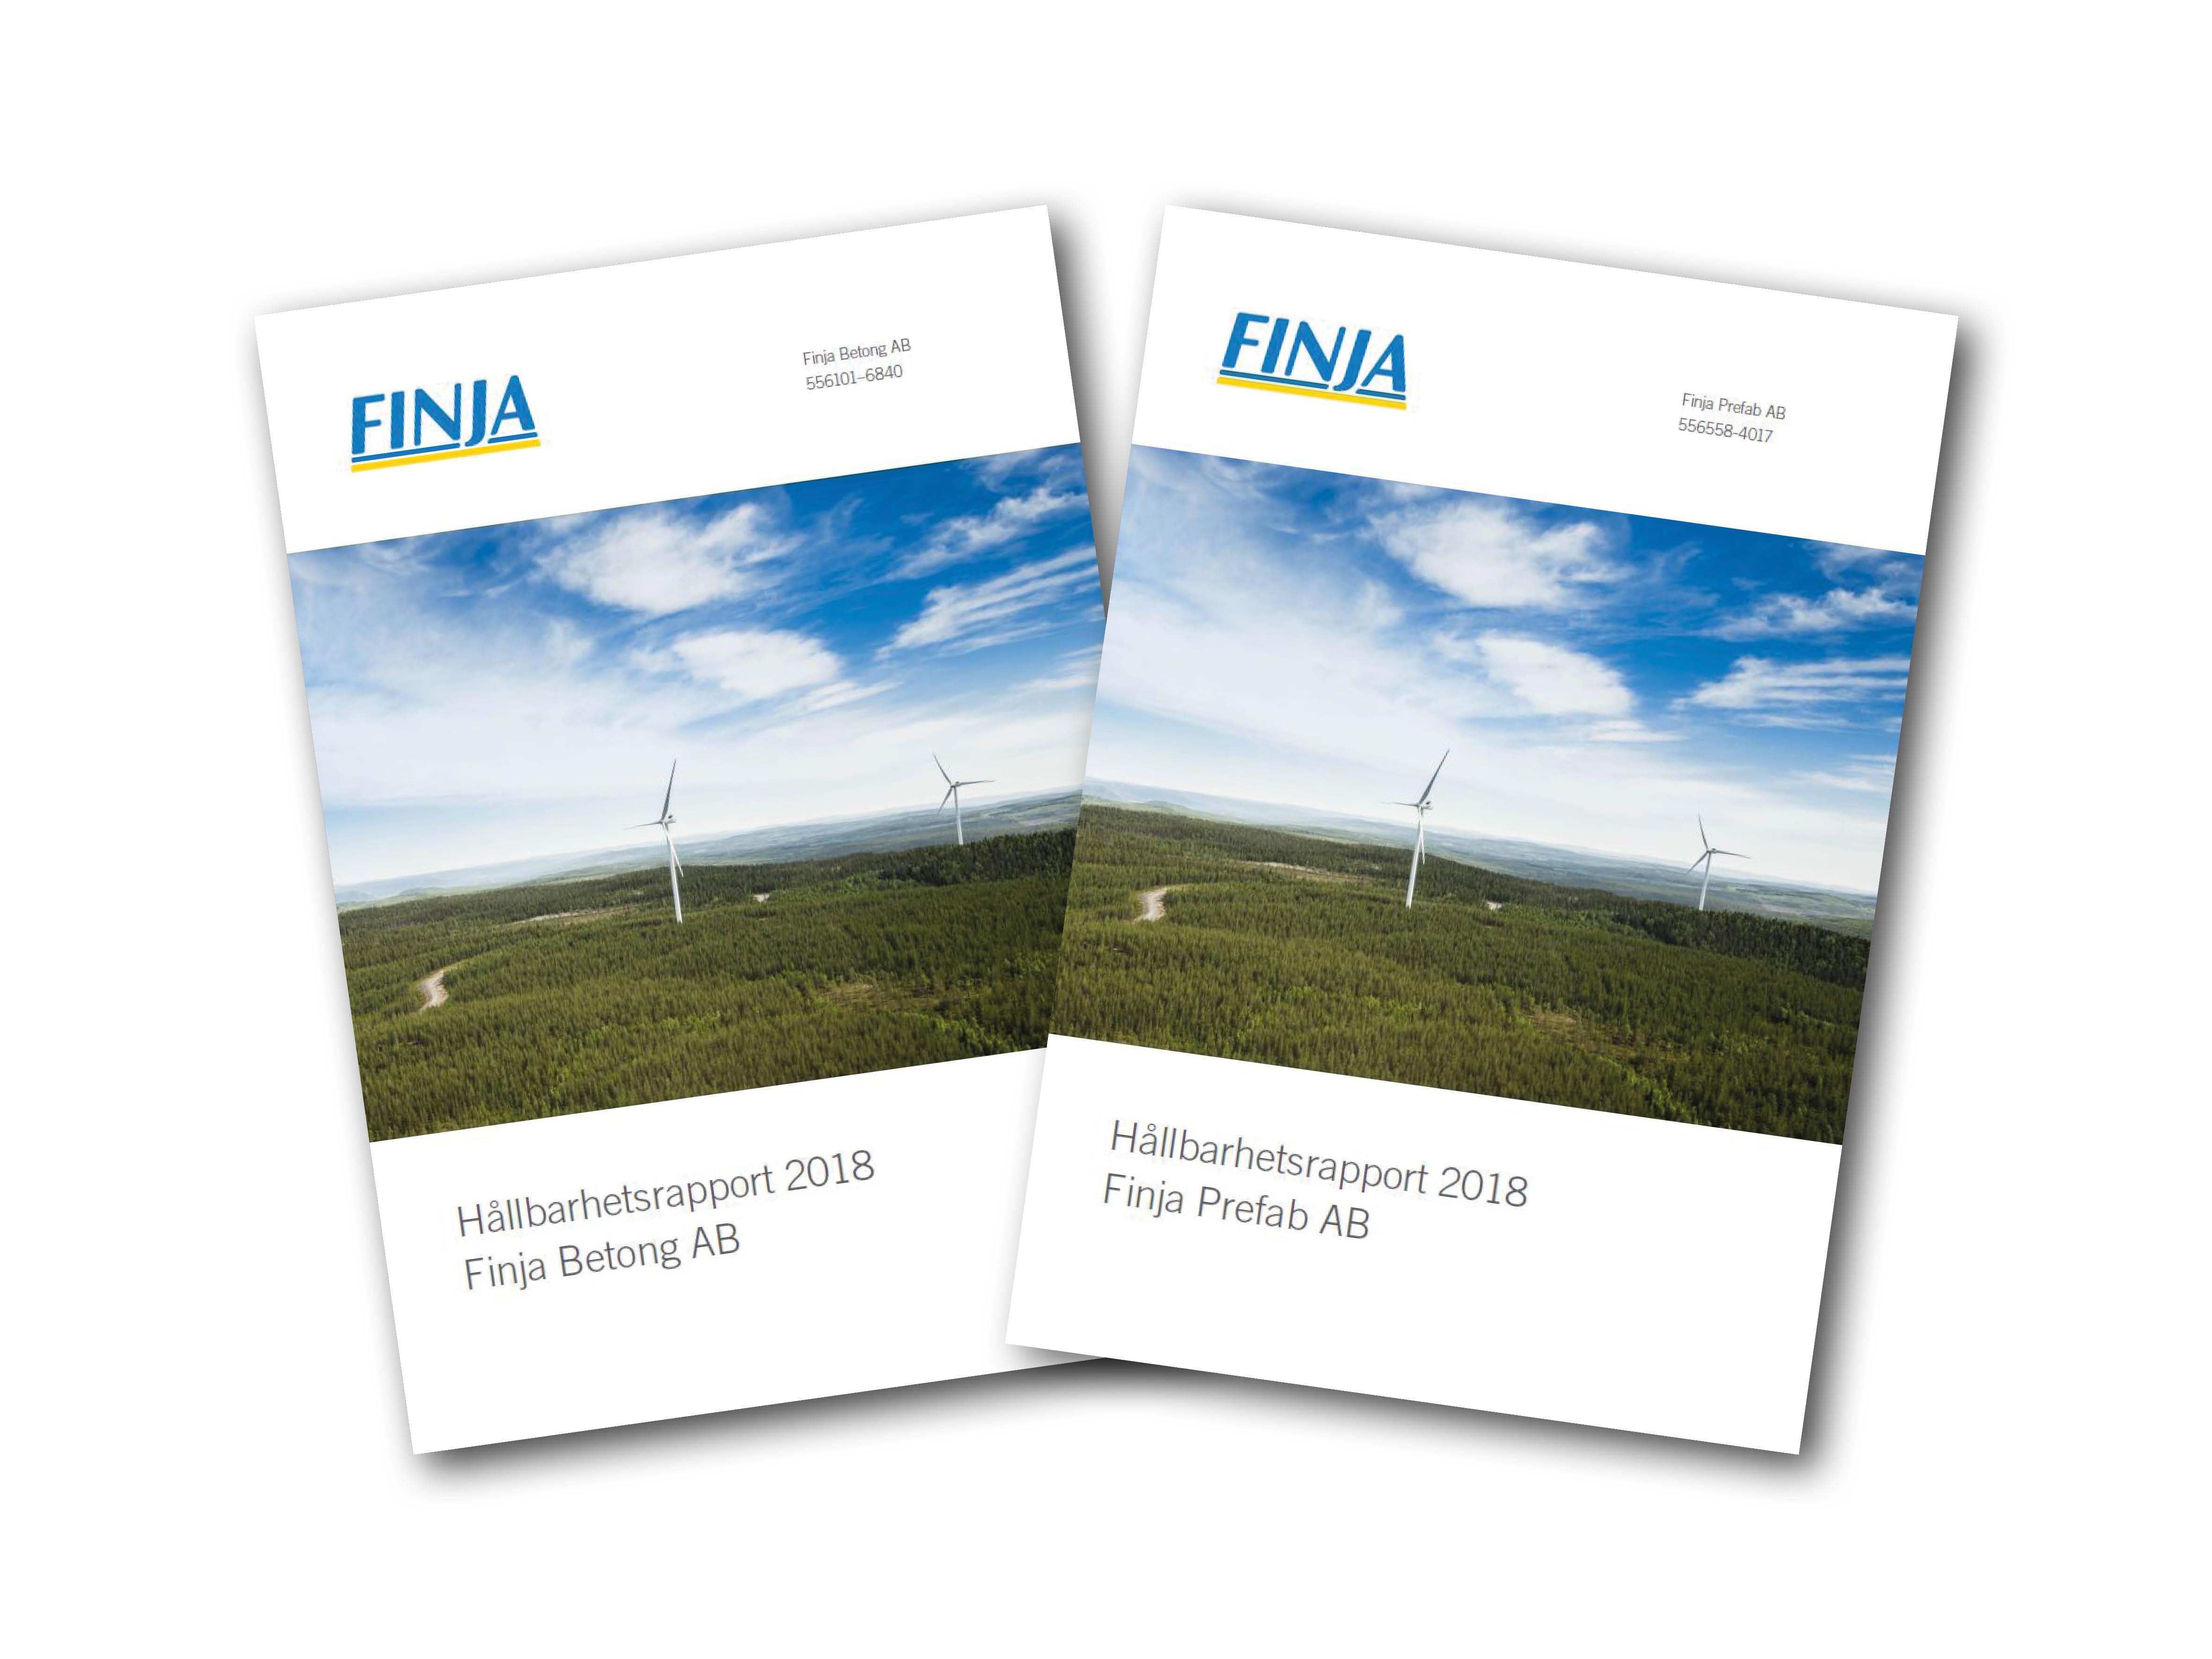 Hållbarhetsrapport